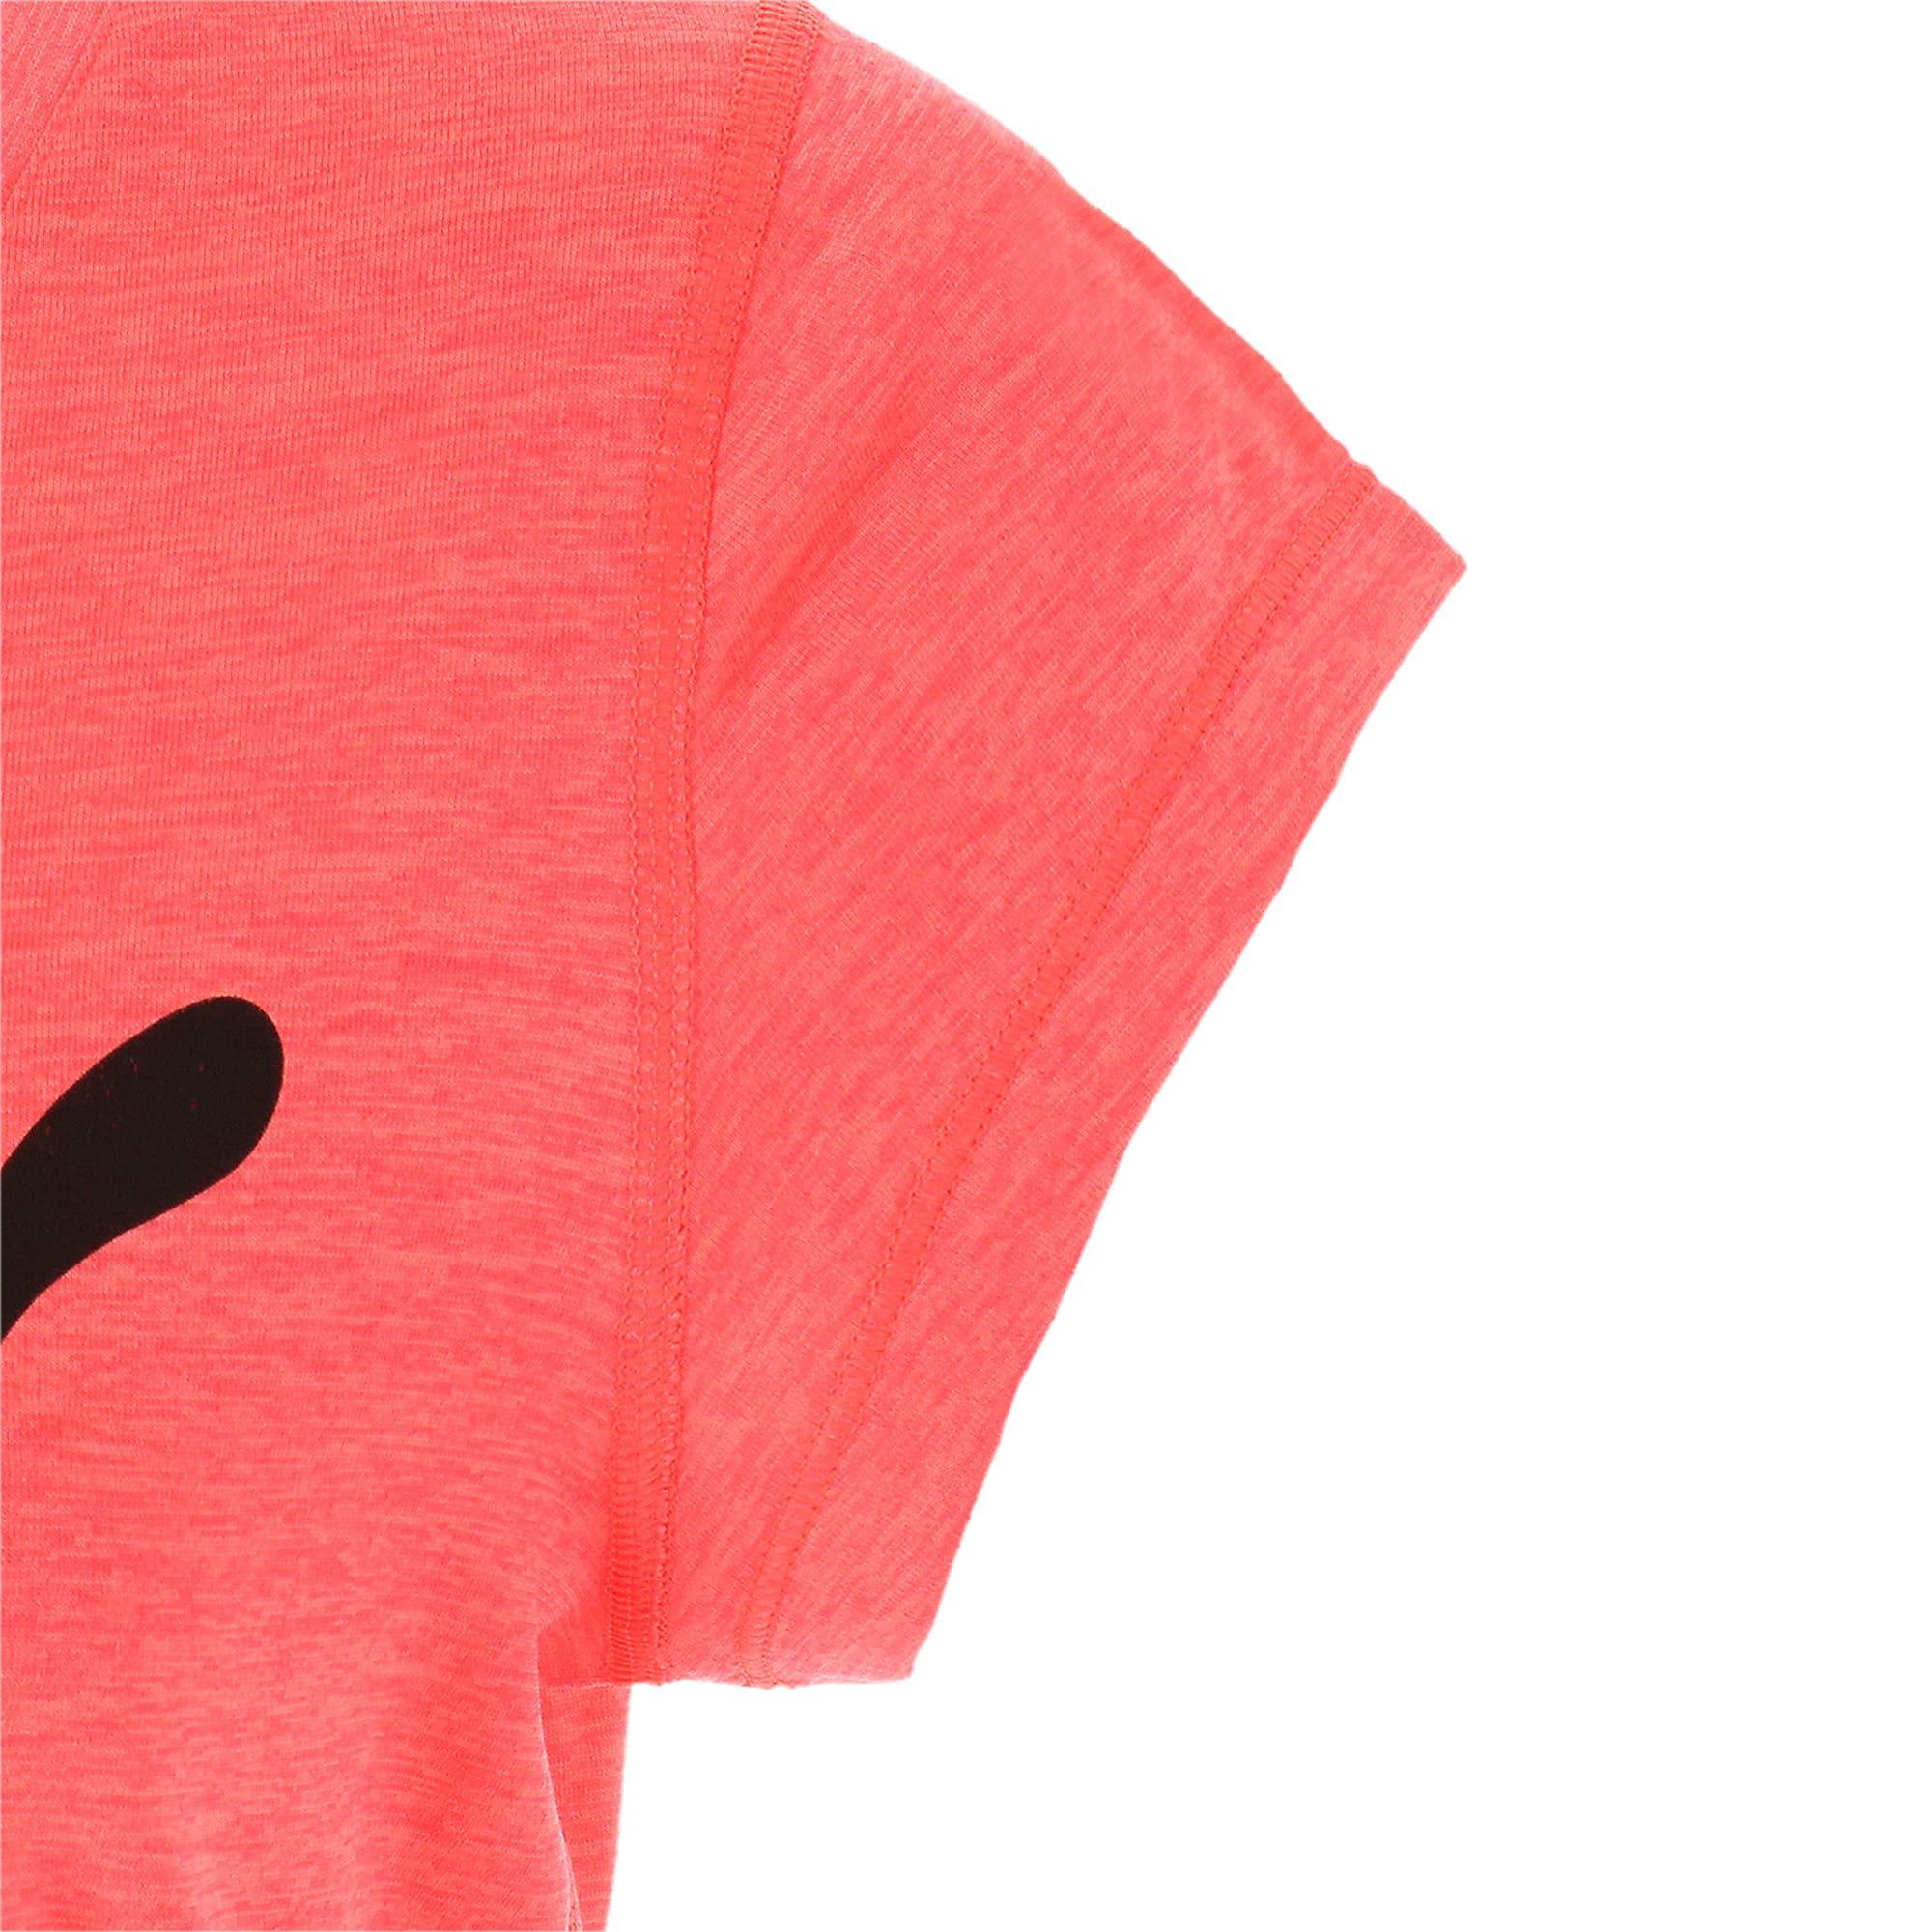 Thumbnail 8 of ヘザー キャット ウィメンズ ランニング Tシャツ 半袖, Pink Alert, medium-JPN